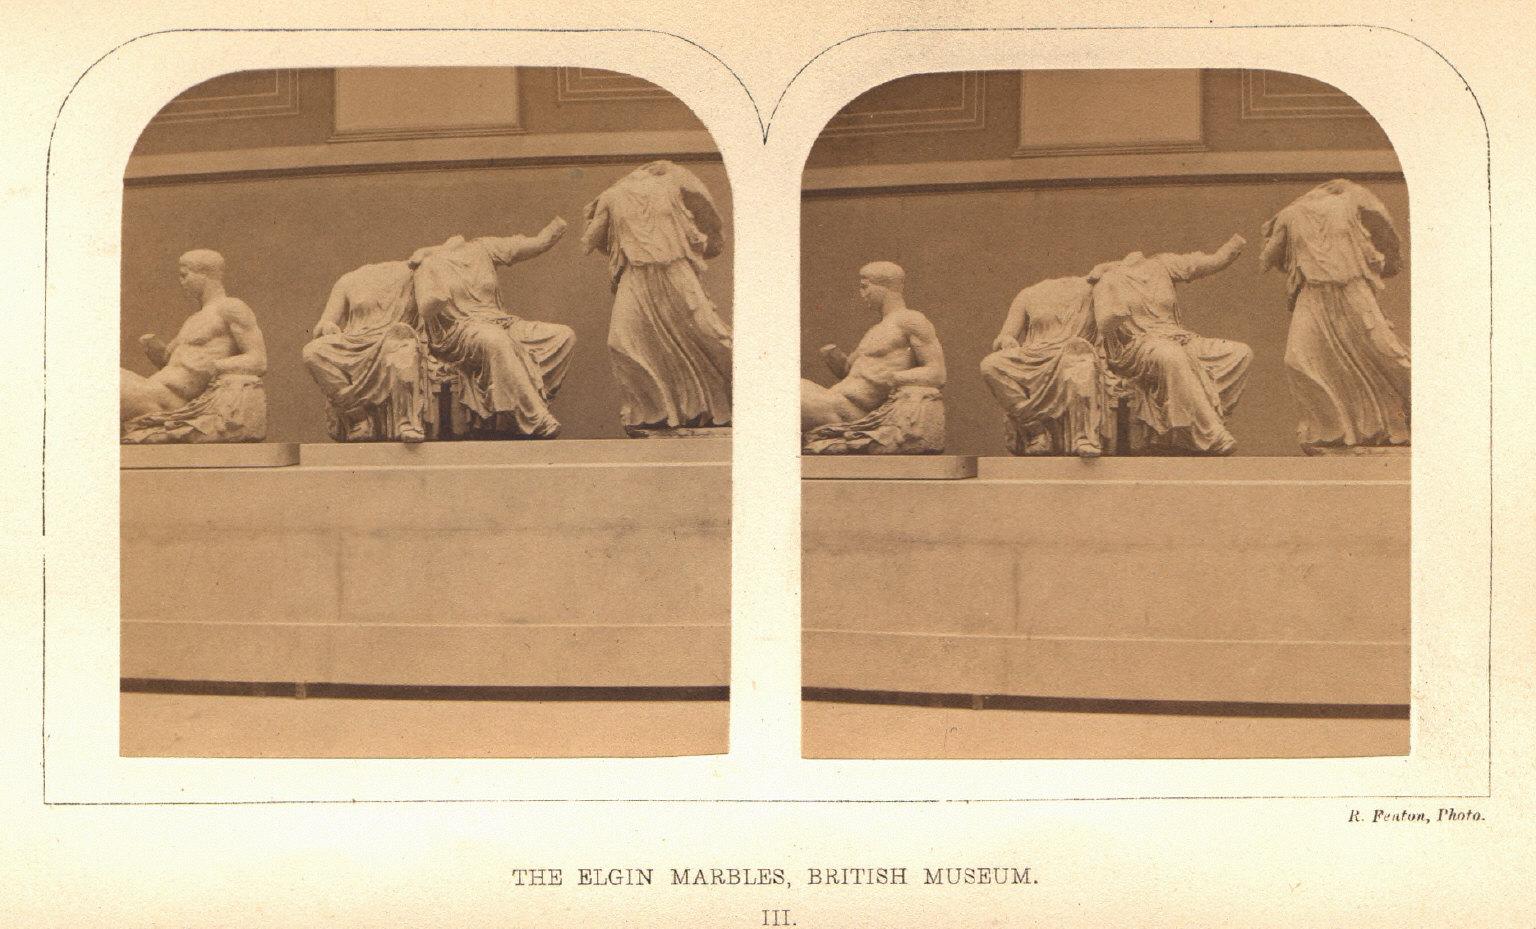 The Elgin Marbles, British Museum III